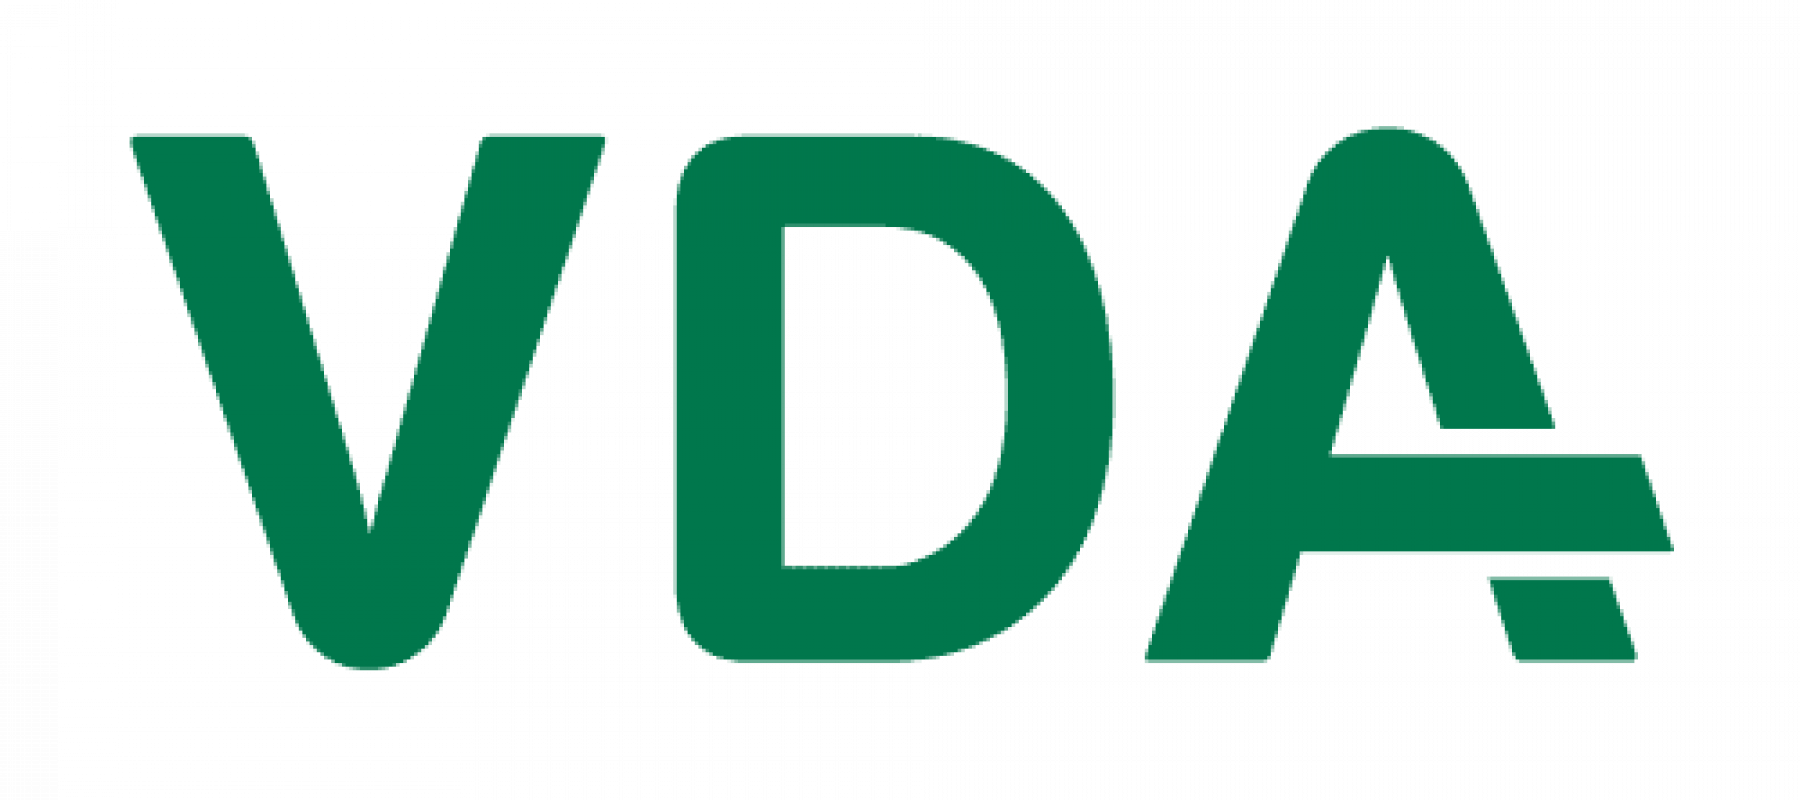 adblue vrac certification vda